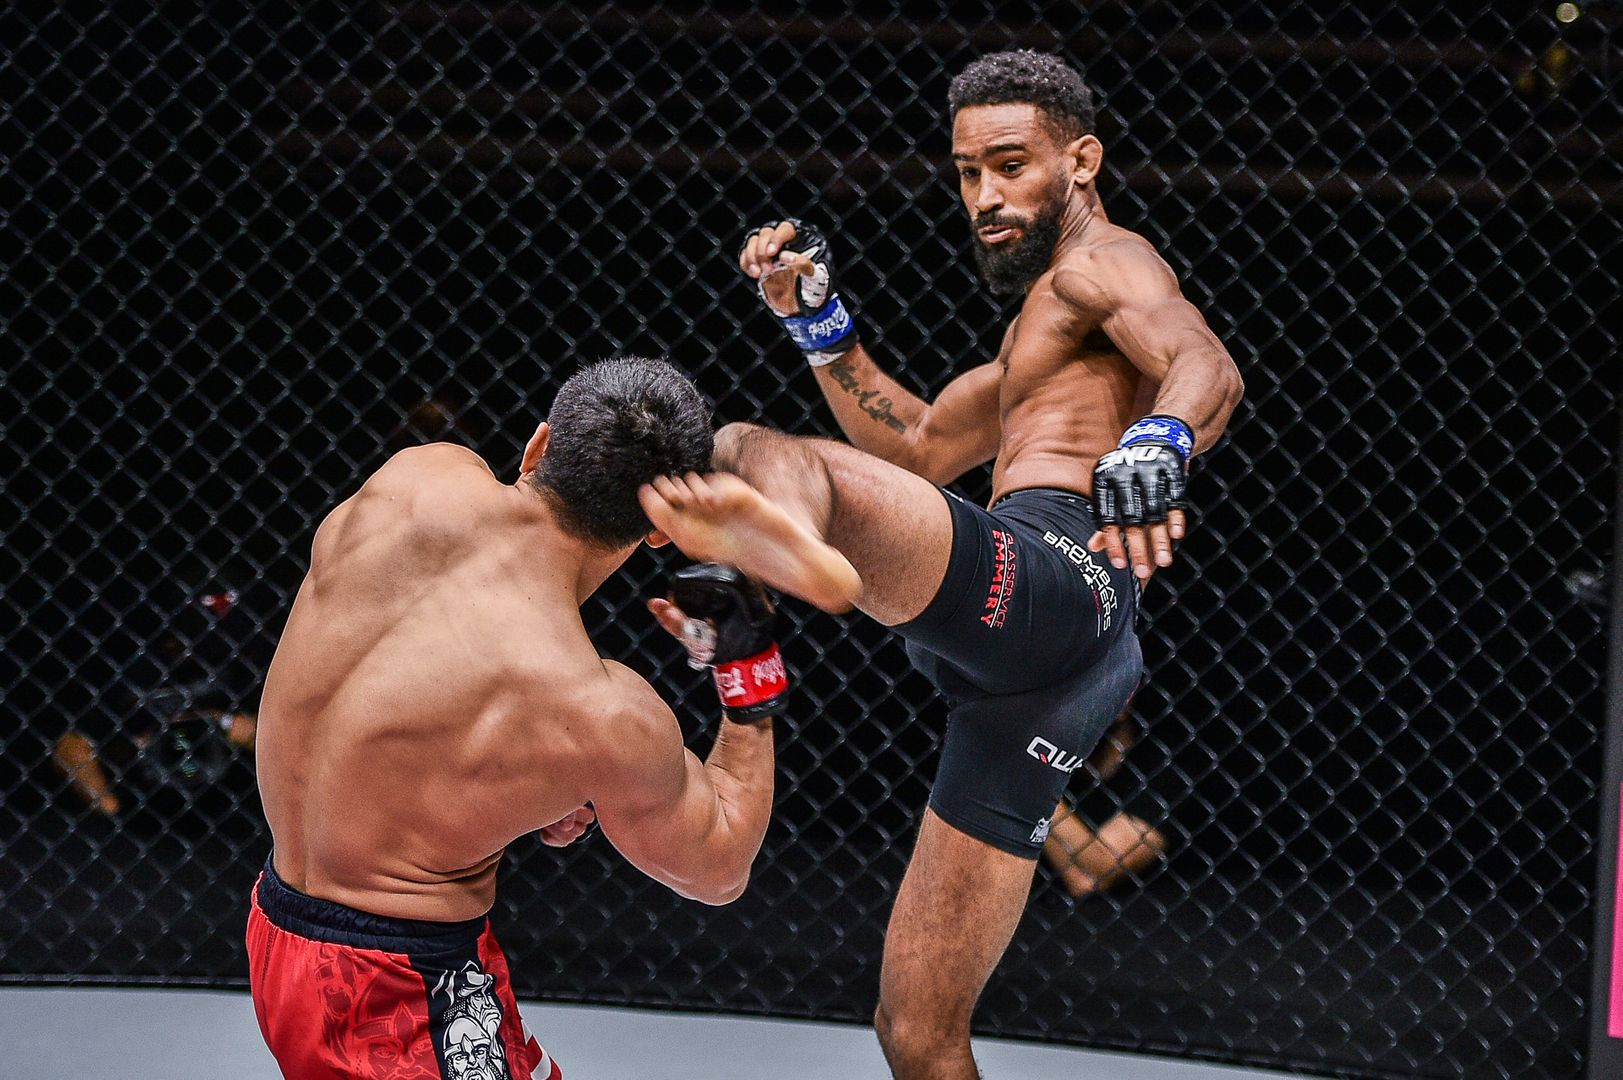 Russian MMA star Timofey Nastyukhin fights Dutch kickboxing Pieter Buist at ONE: INSIDE THE MATRIX II in Singapore